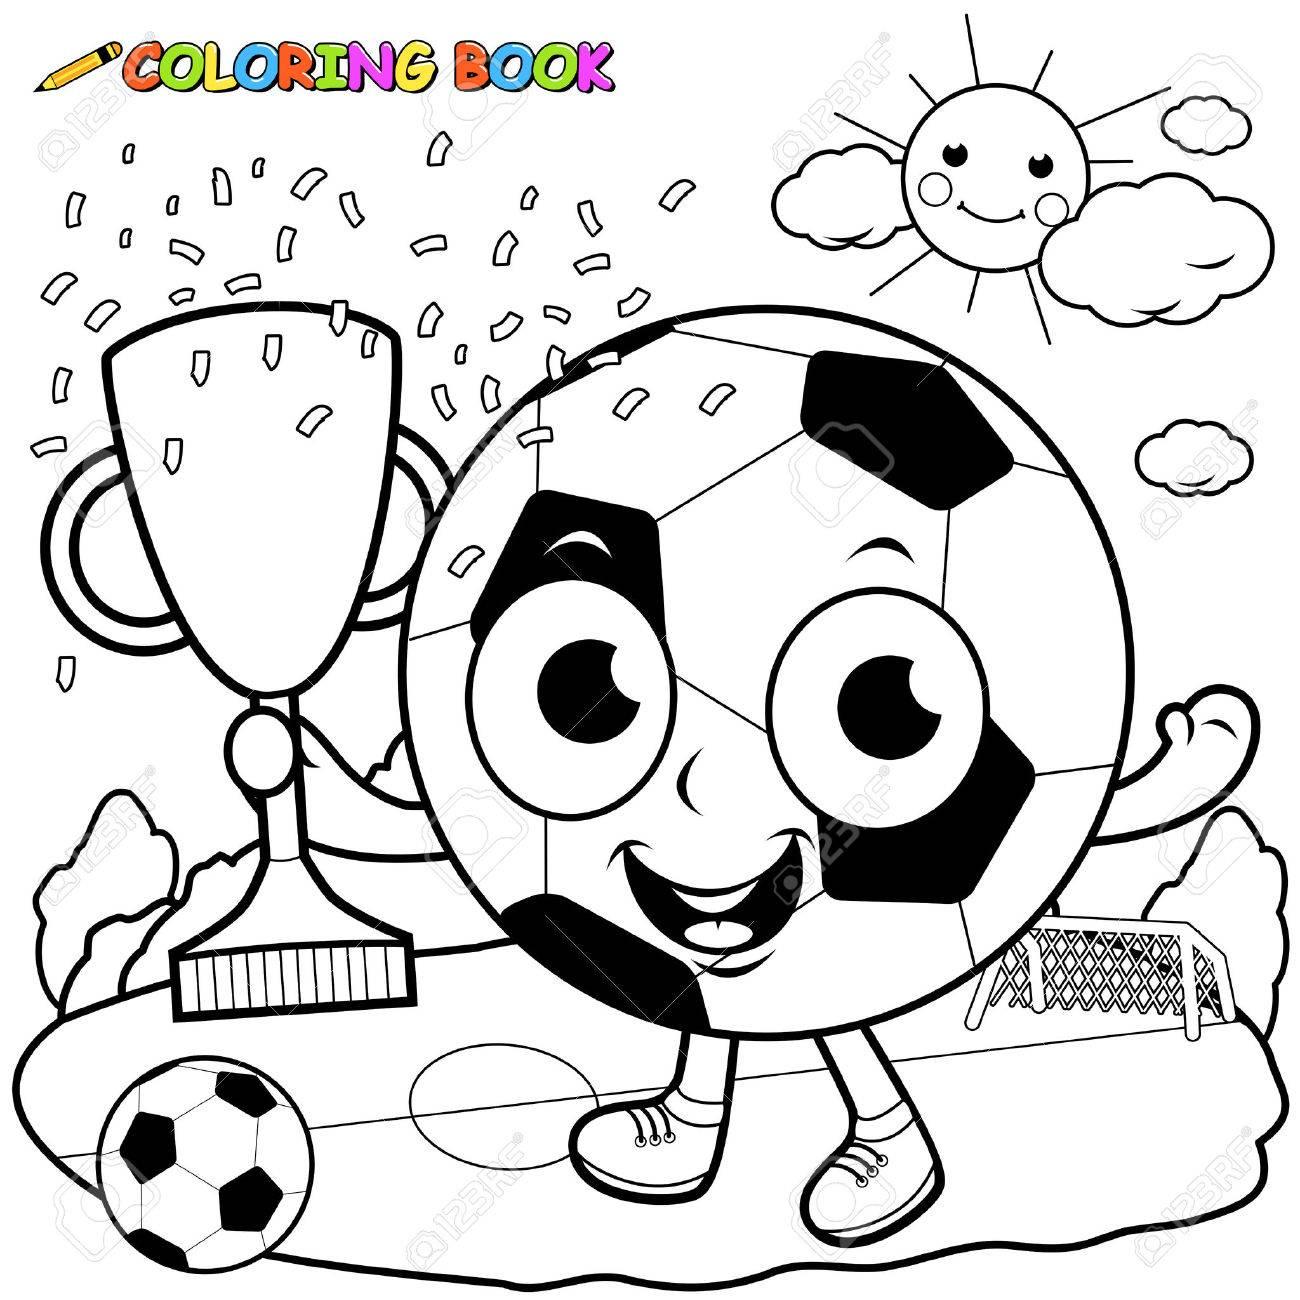 Meister-Cartoon Fußball Hält Trophäe Malbuch Seite Lizenzfrei ...